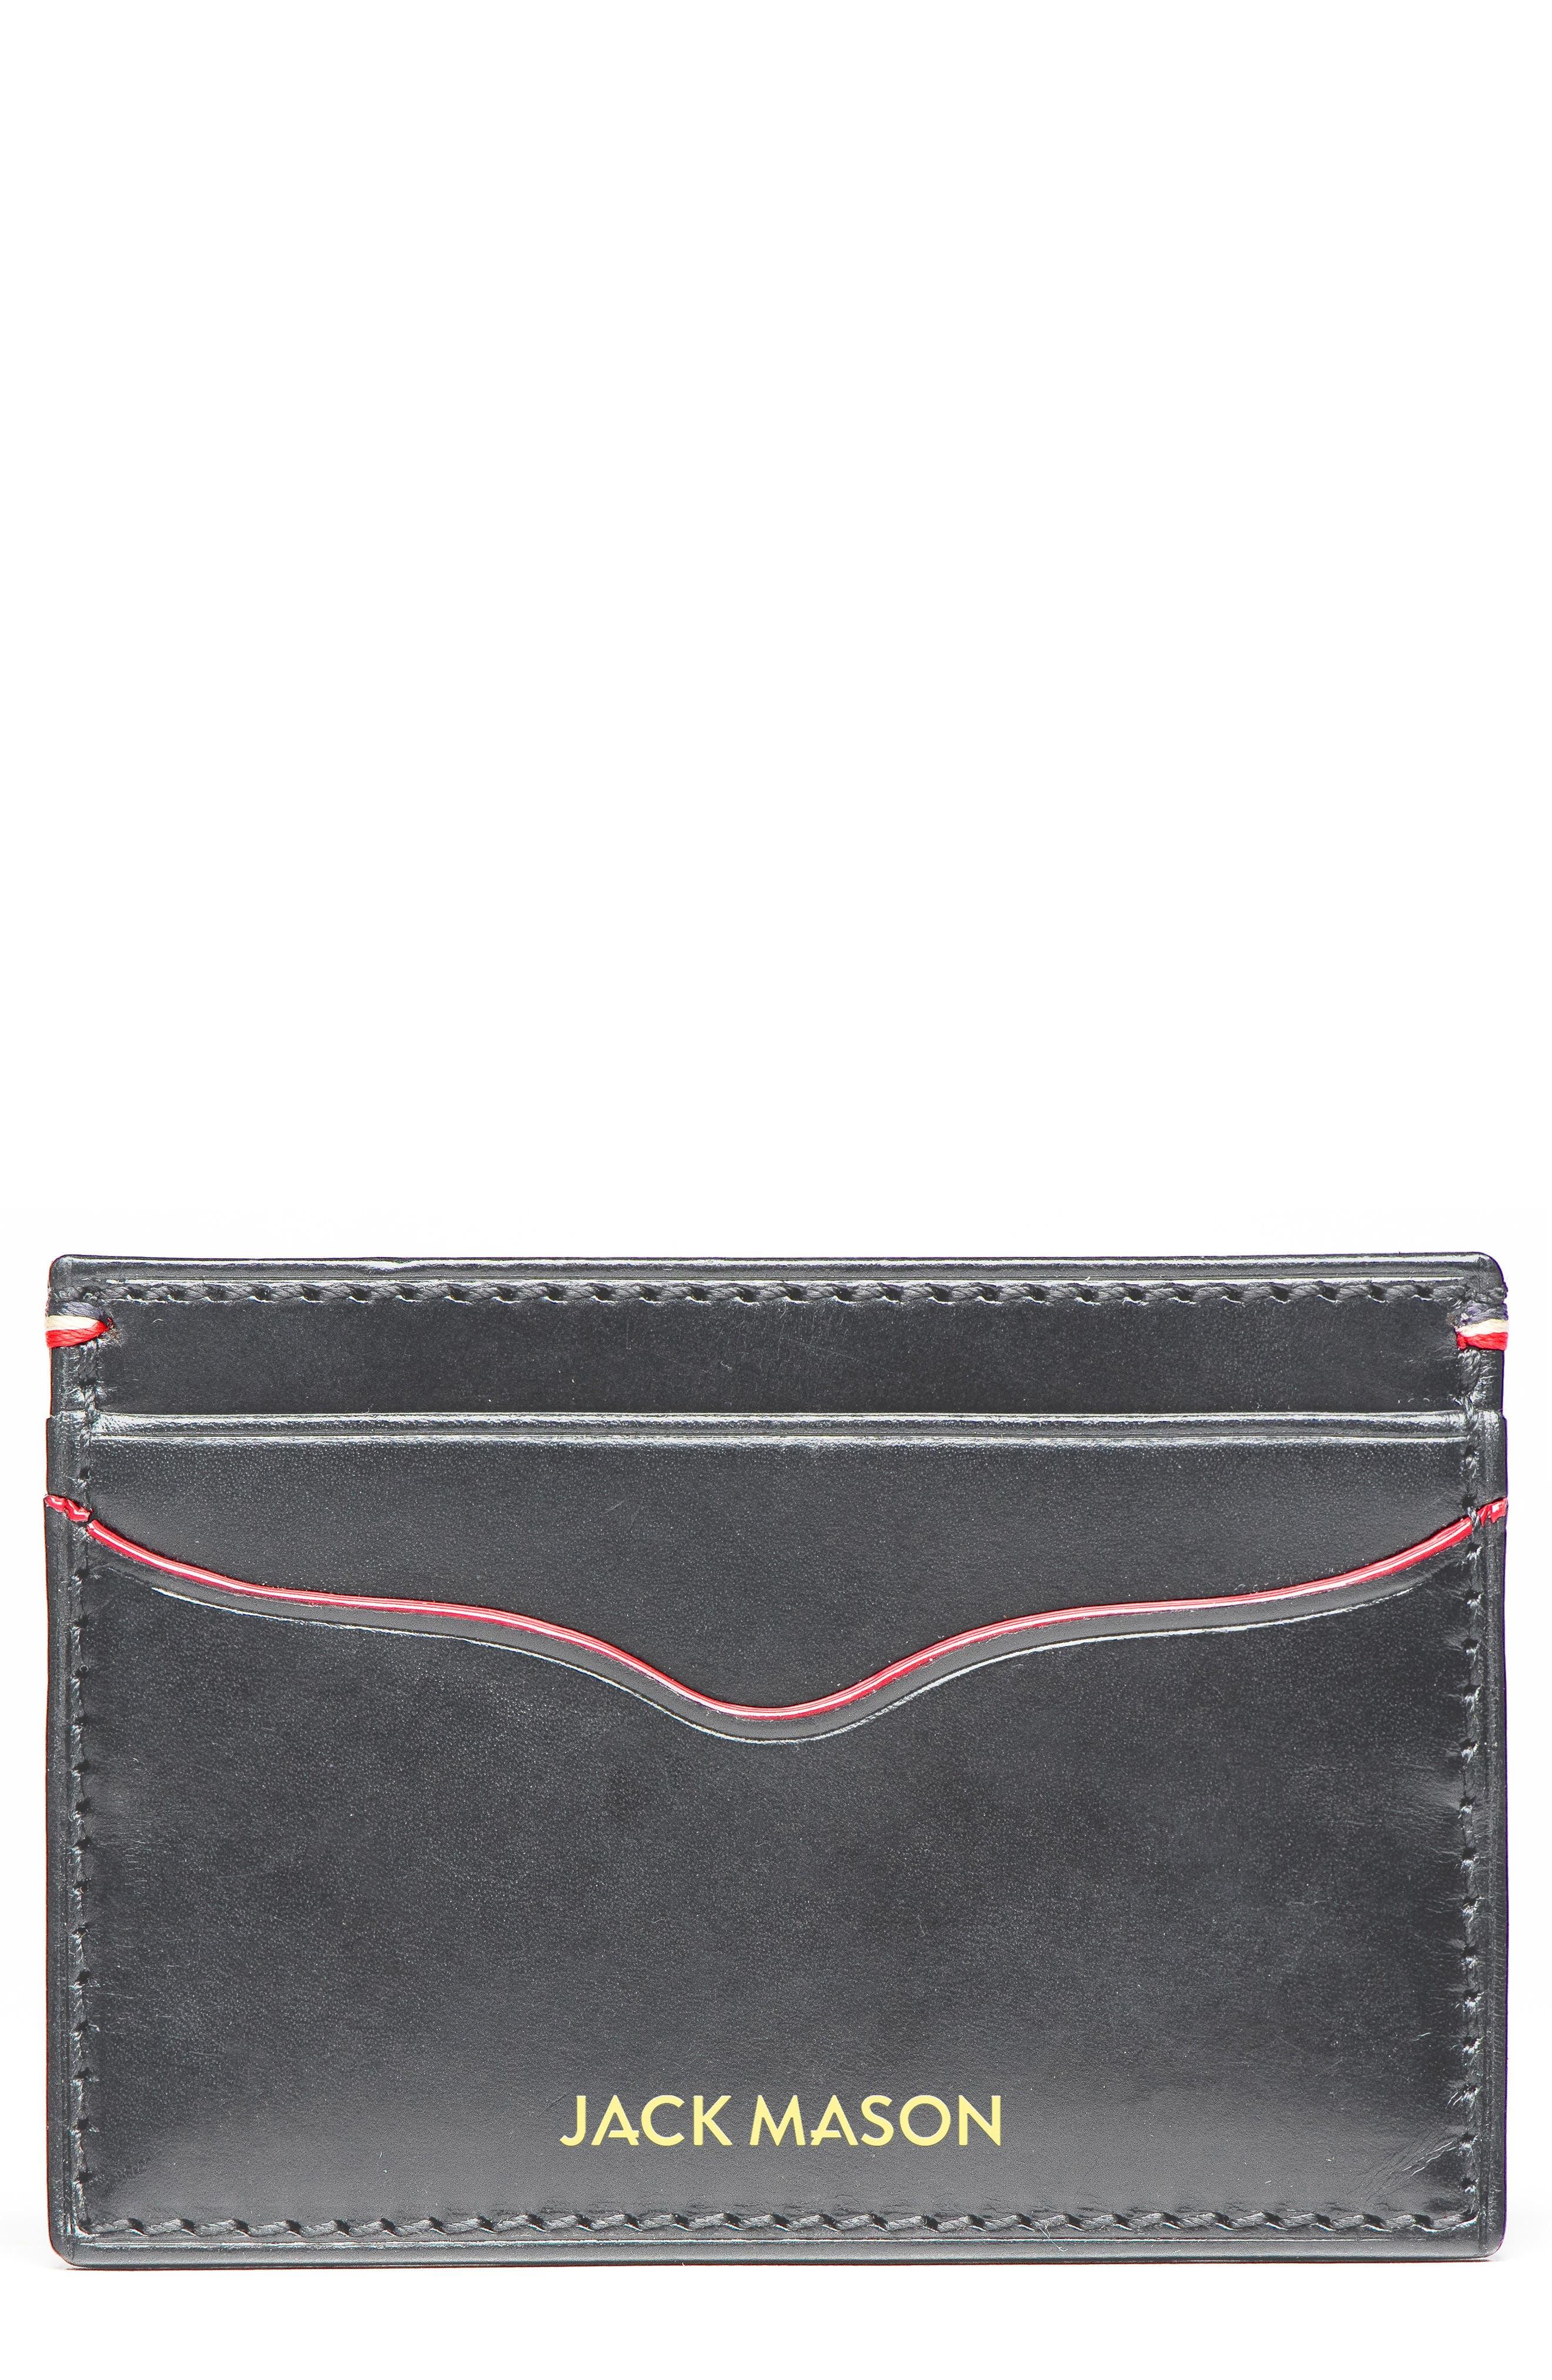 JACK MASON Lux Leather Card Case